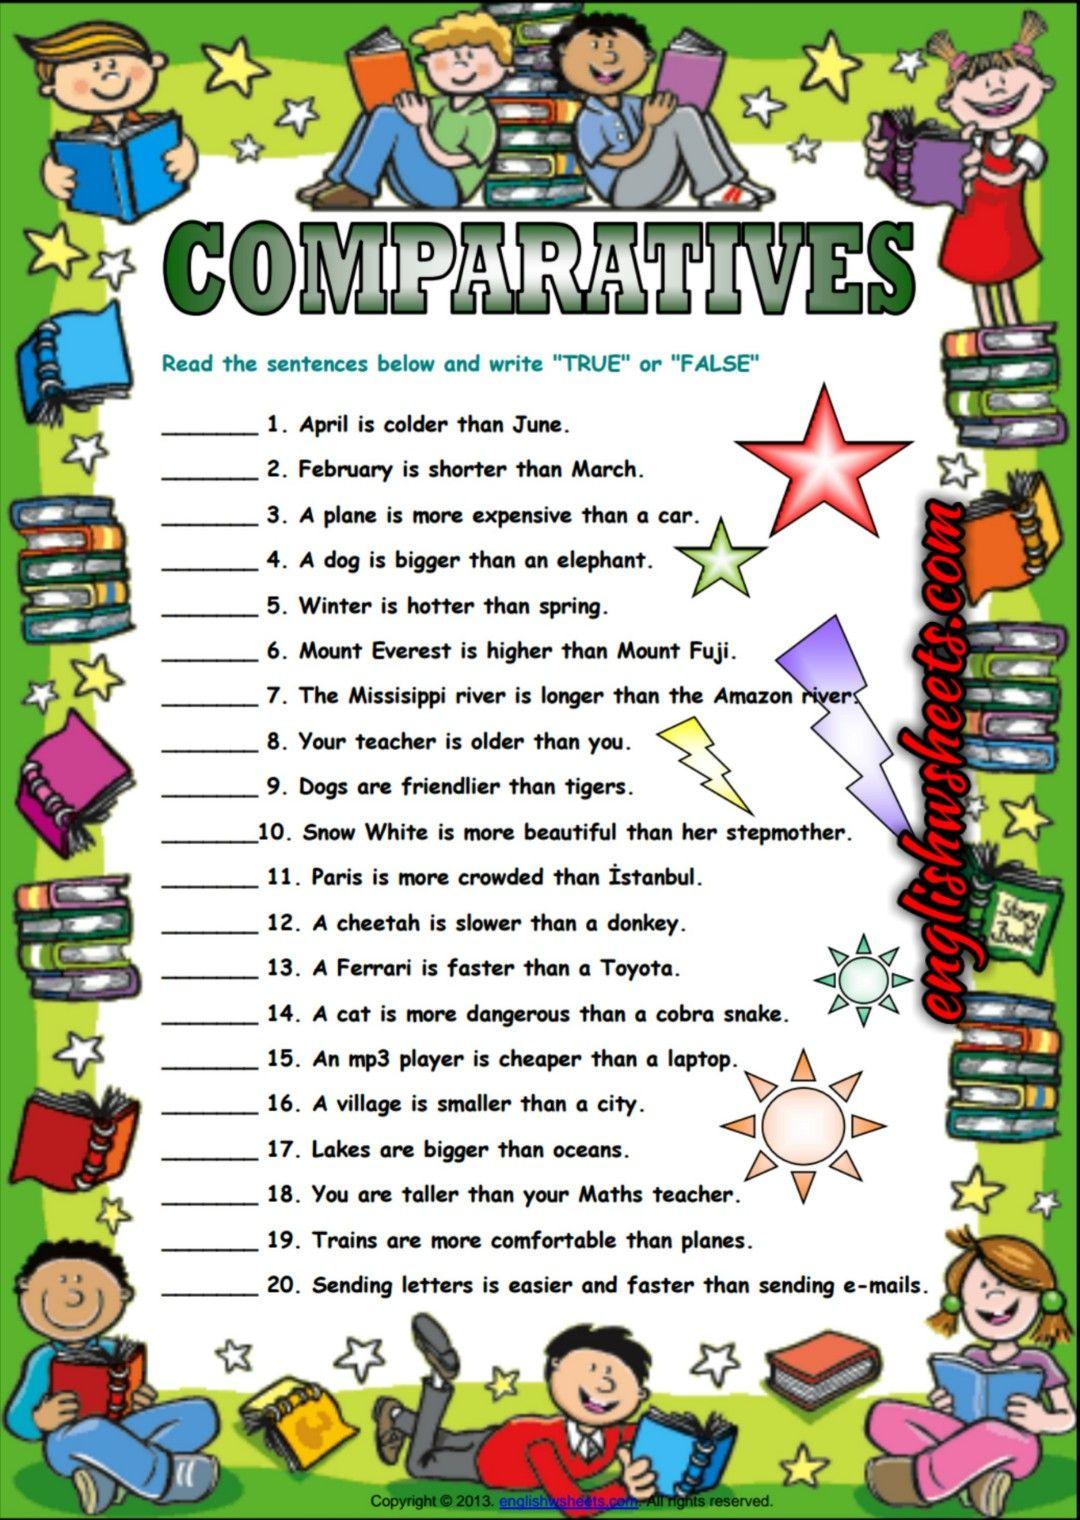 Comparatives True Or False Esl Exercise Worksheet Teaching